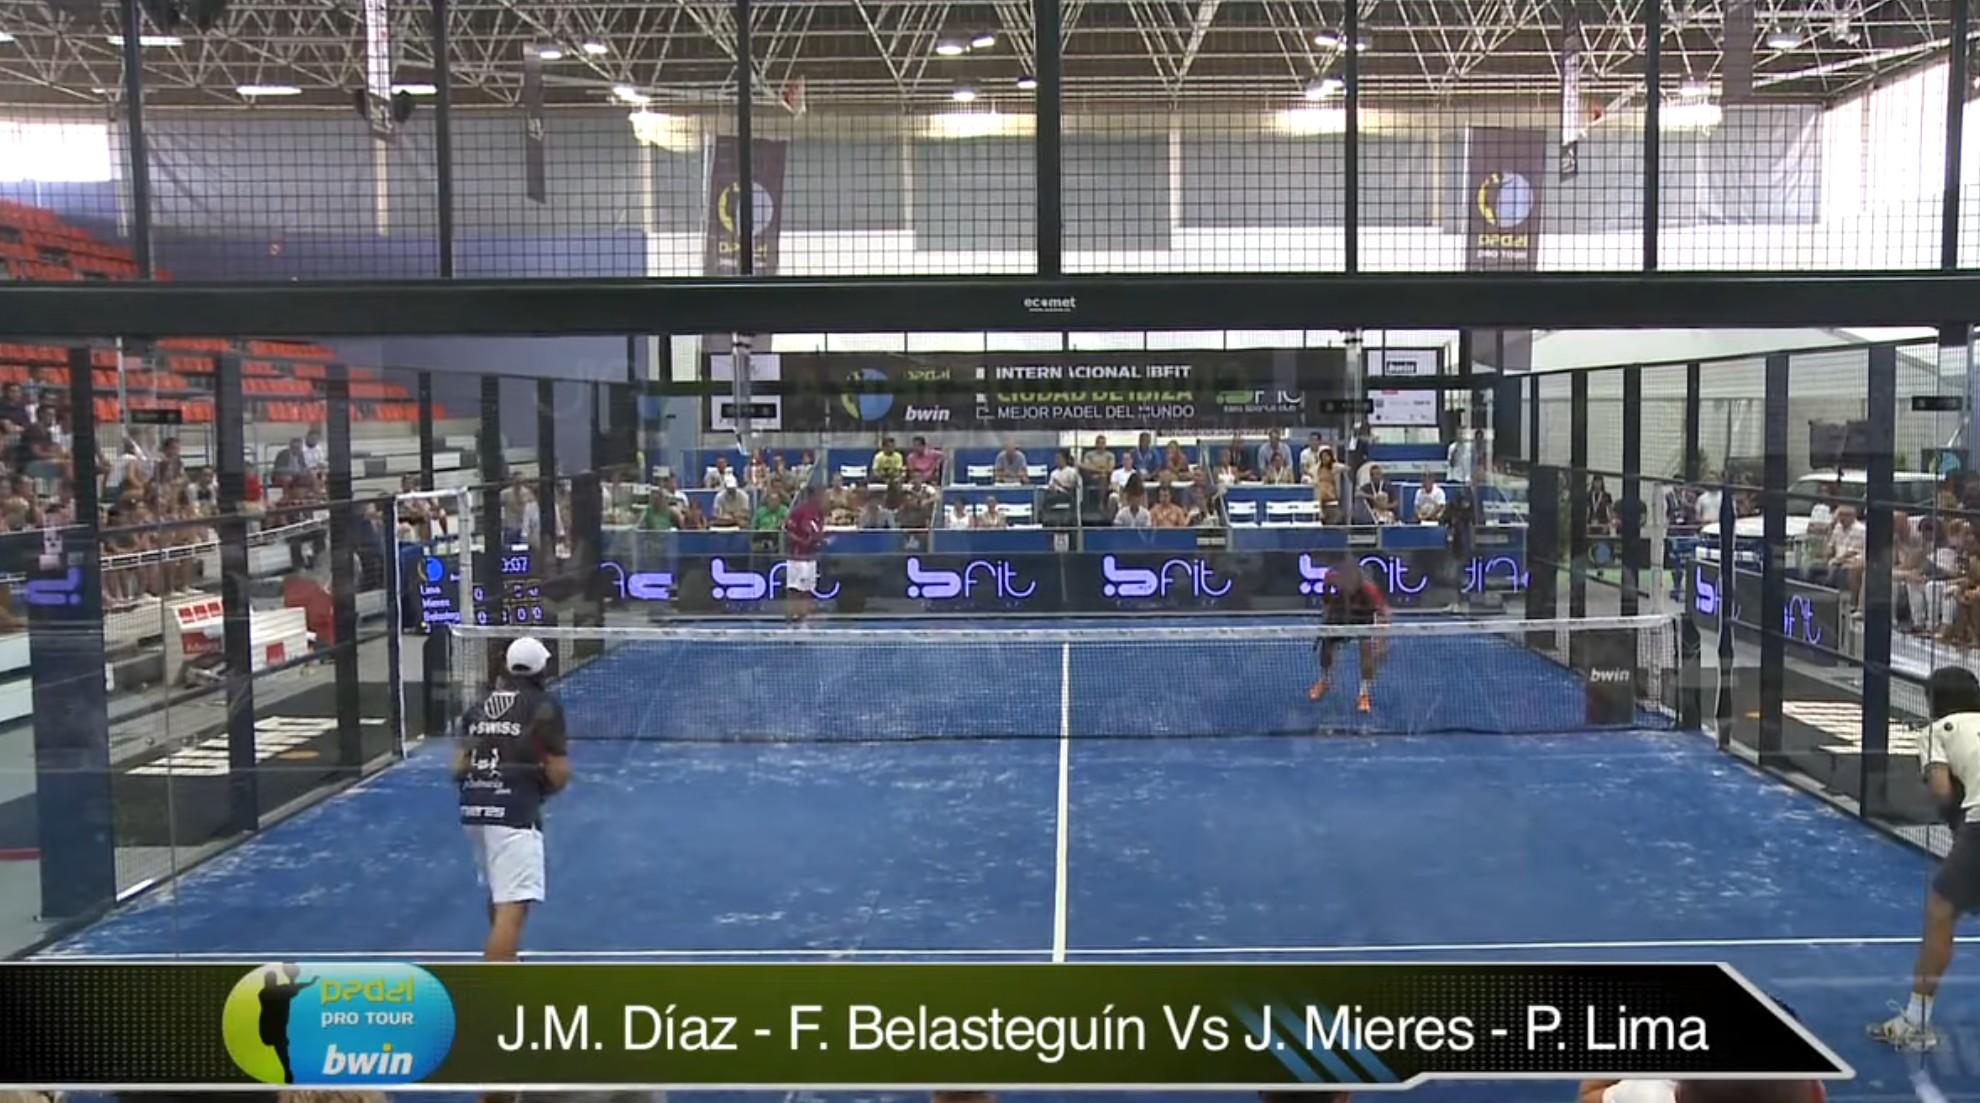 Finale - JM Diaz - F. Belasteguin gegen J. Mieres - P. Lima - Padelpro Runde ibiza 2012